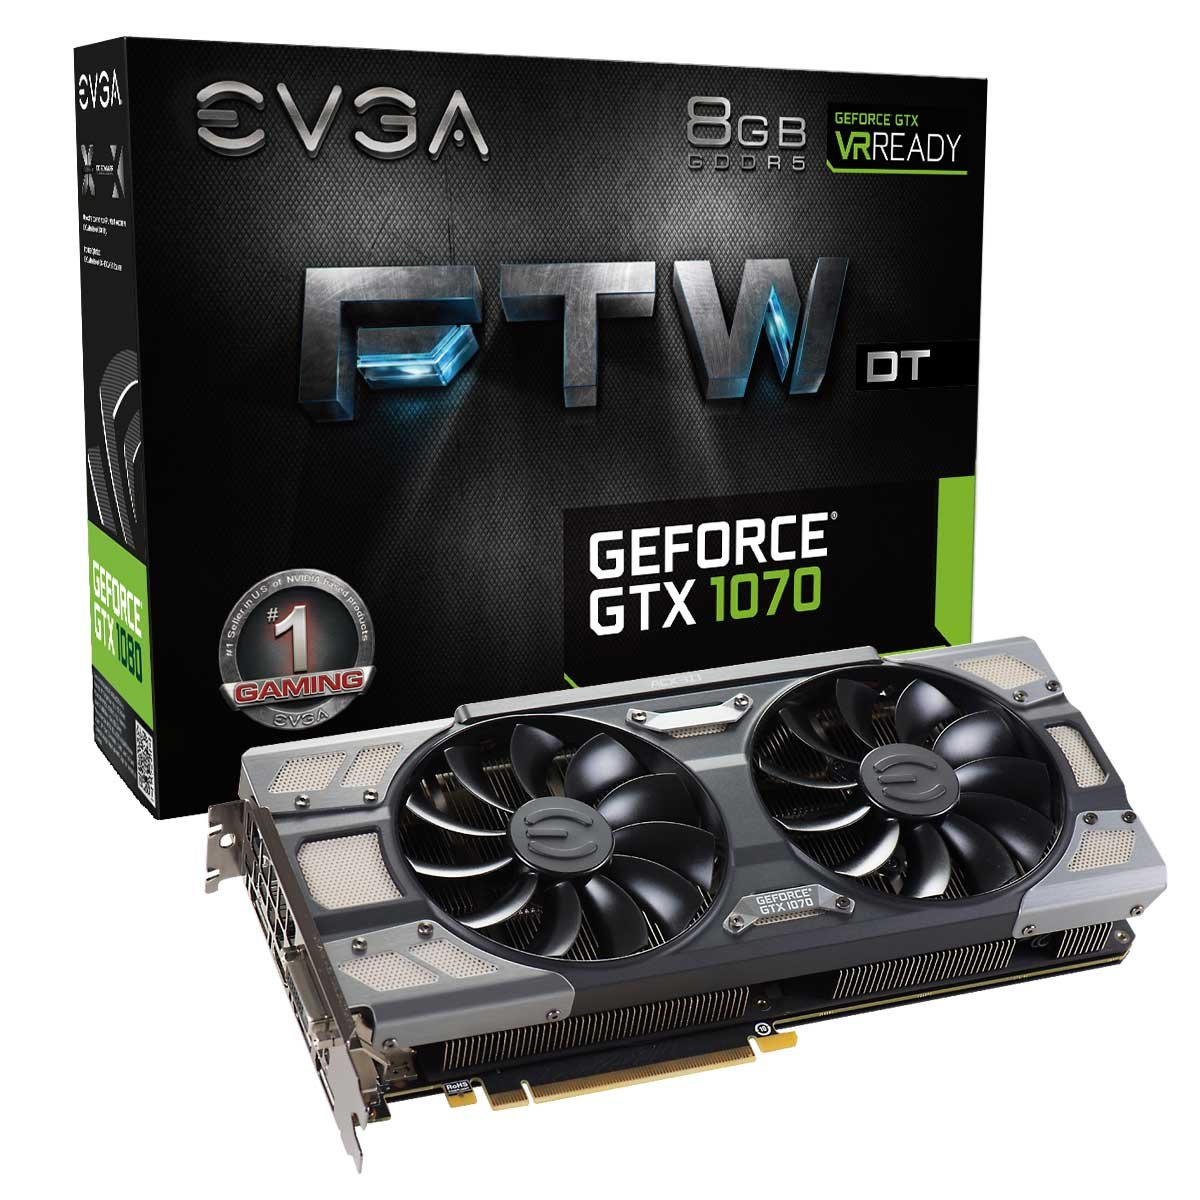 EVGA GeForce GTX 1070 FTW DT Gaming ACX 3.0 8 GB GDDR5 - Tarjeta ...